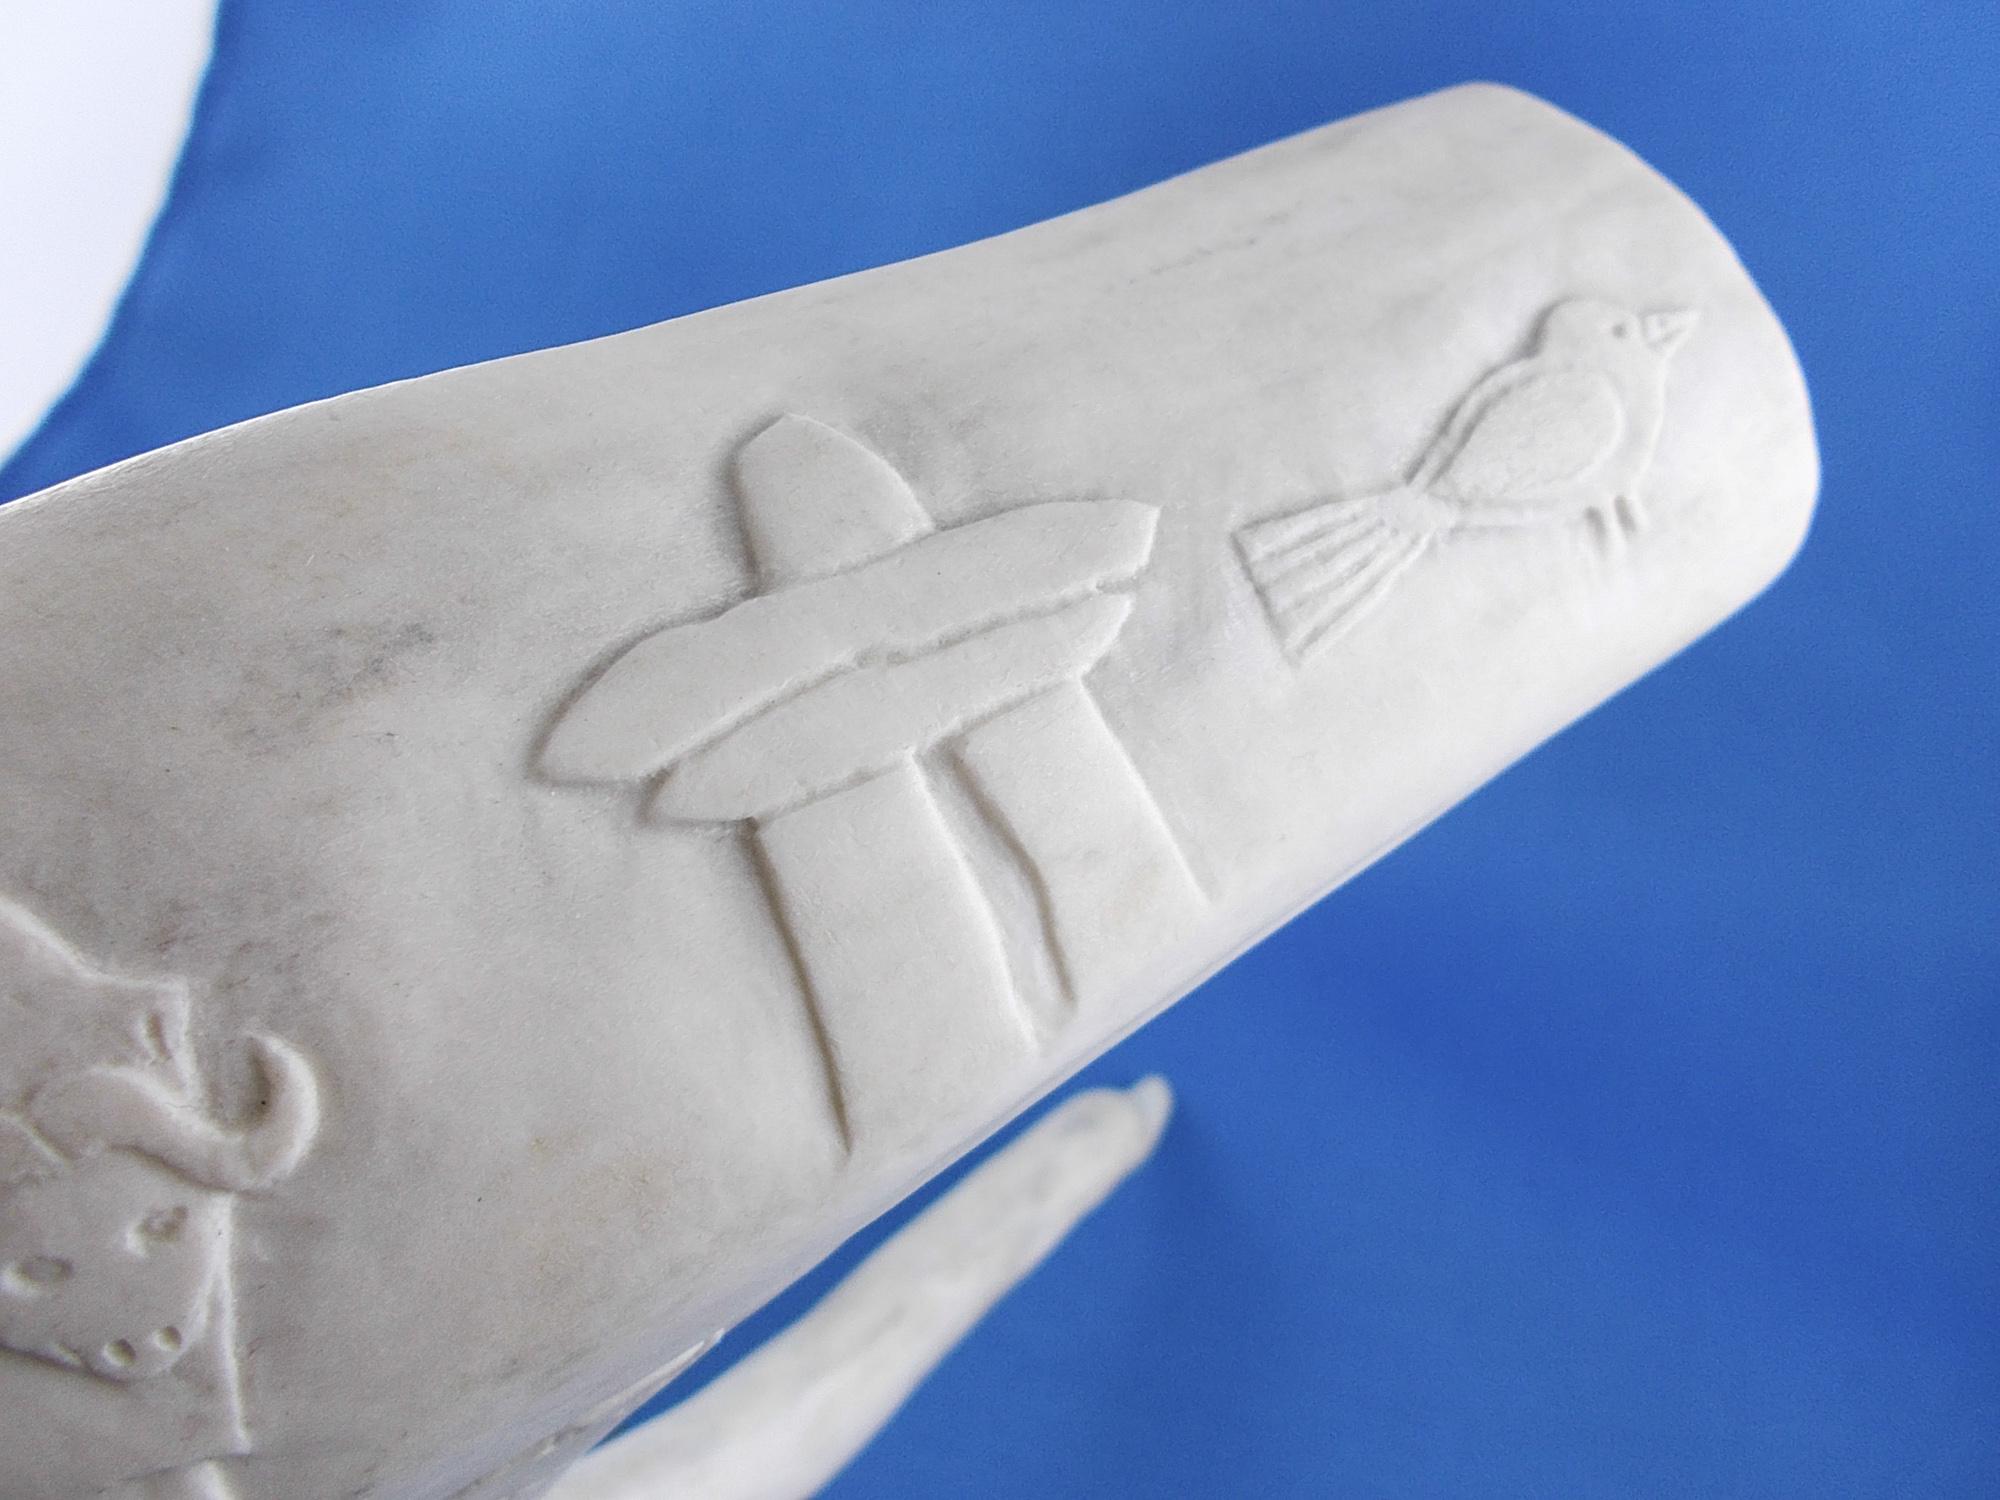 Caribou antler carving